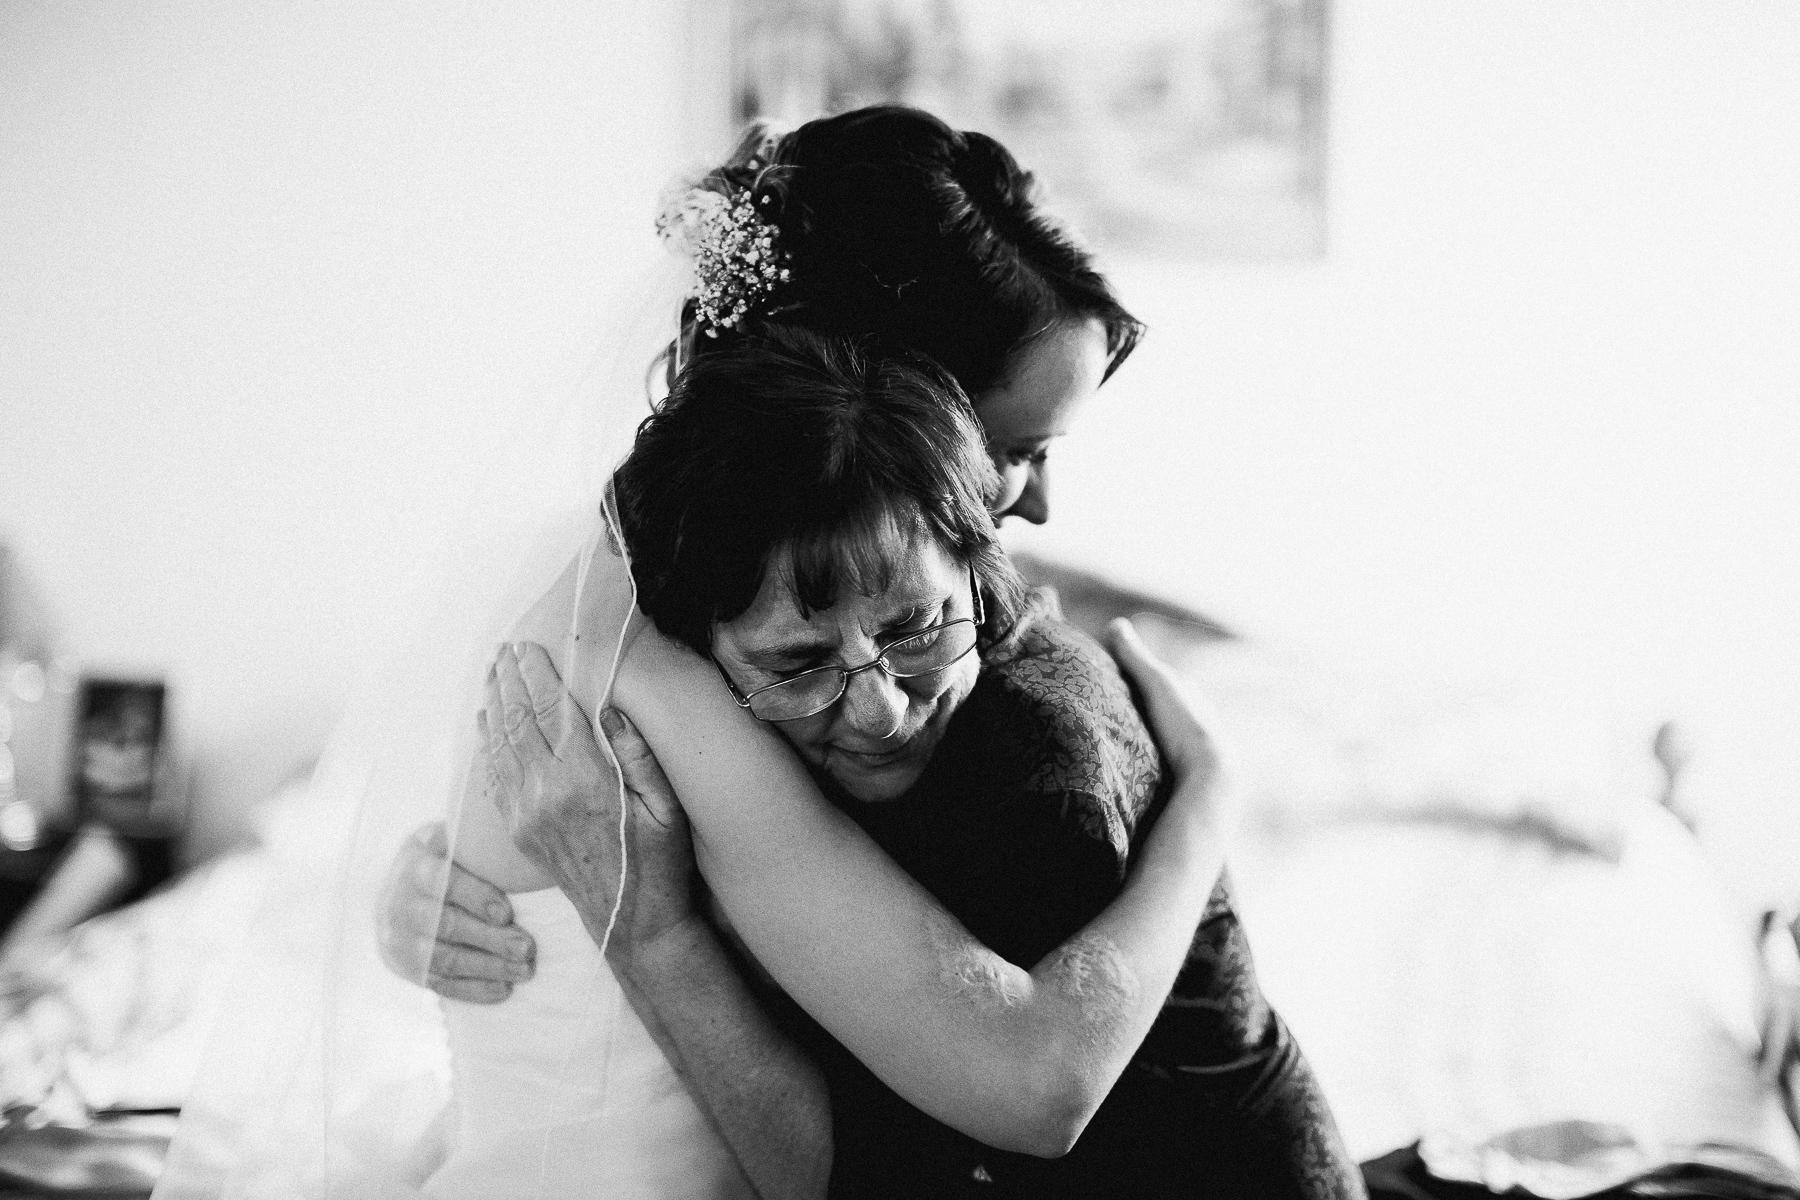 170708-Luxium-Weddings-Arizona-Sheraton-Phoenix-Arizona-Photographer-Hilton-Hawaiian-1003.jpg